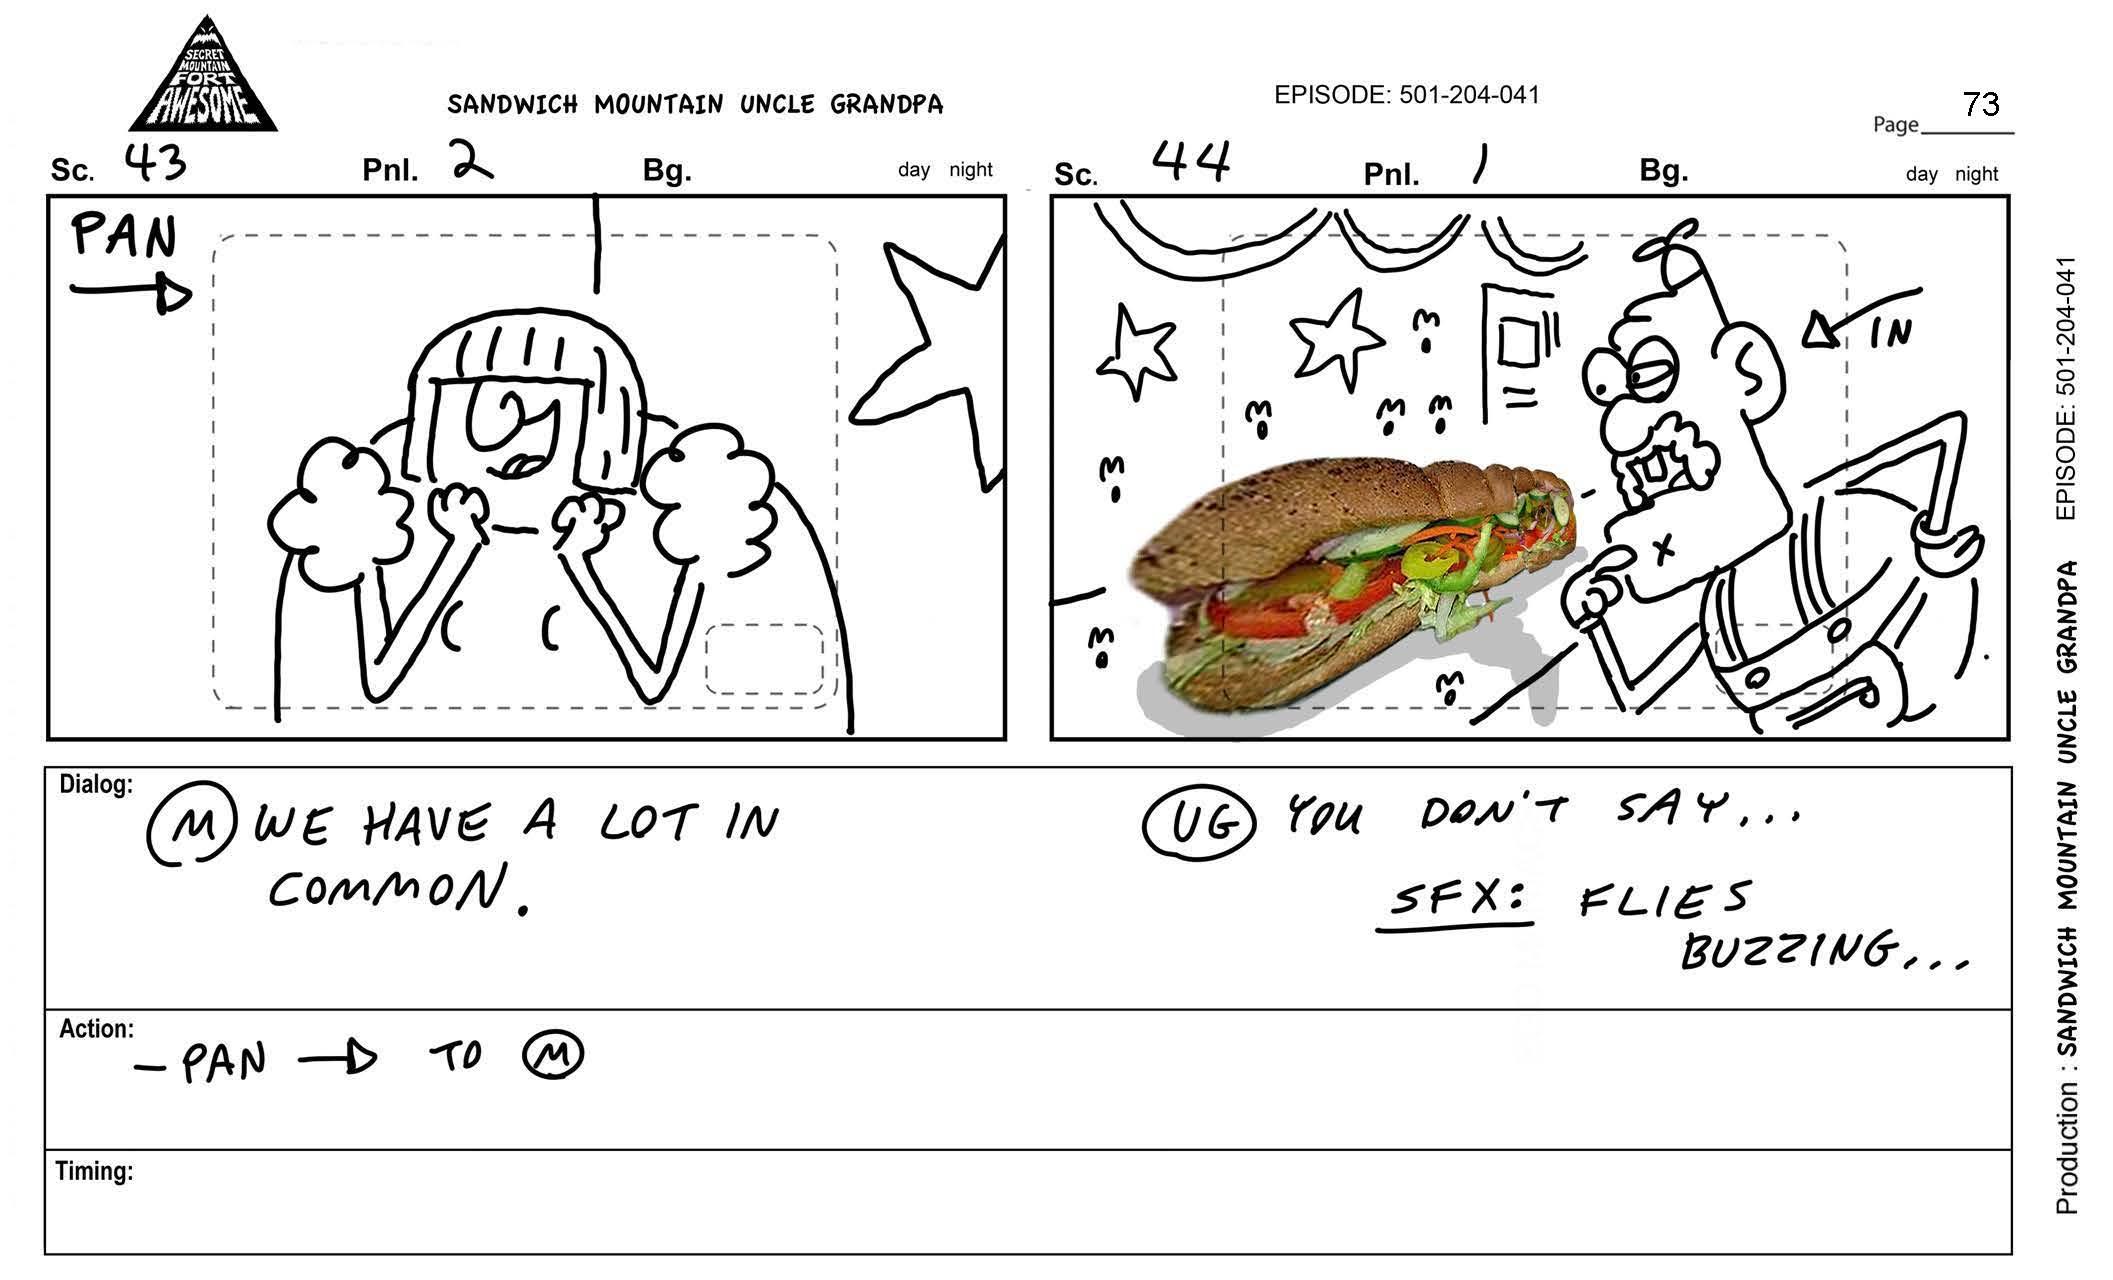 SMFA_SandwichMountainUncleGrandpa_Page_073.jpg